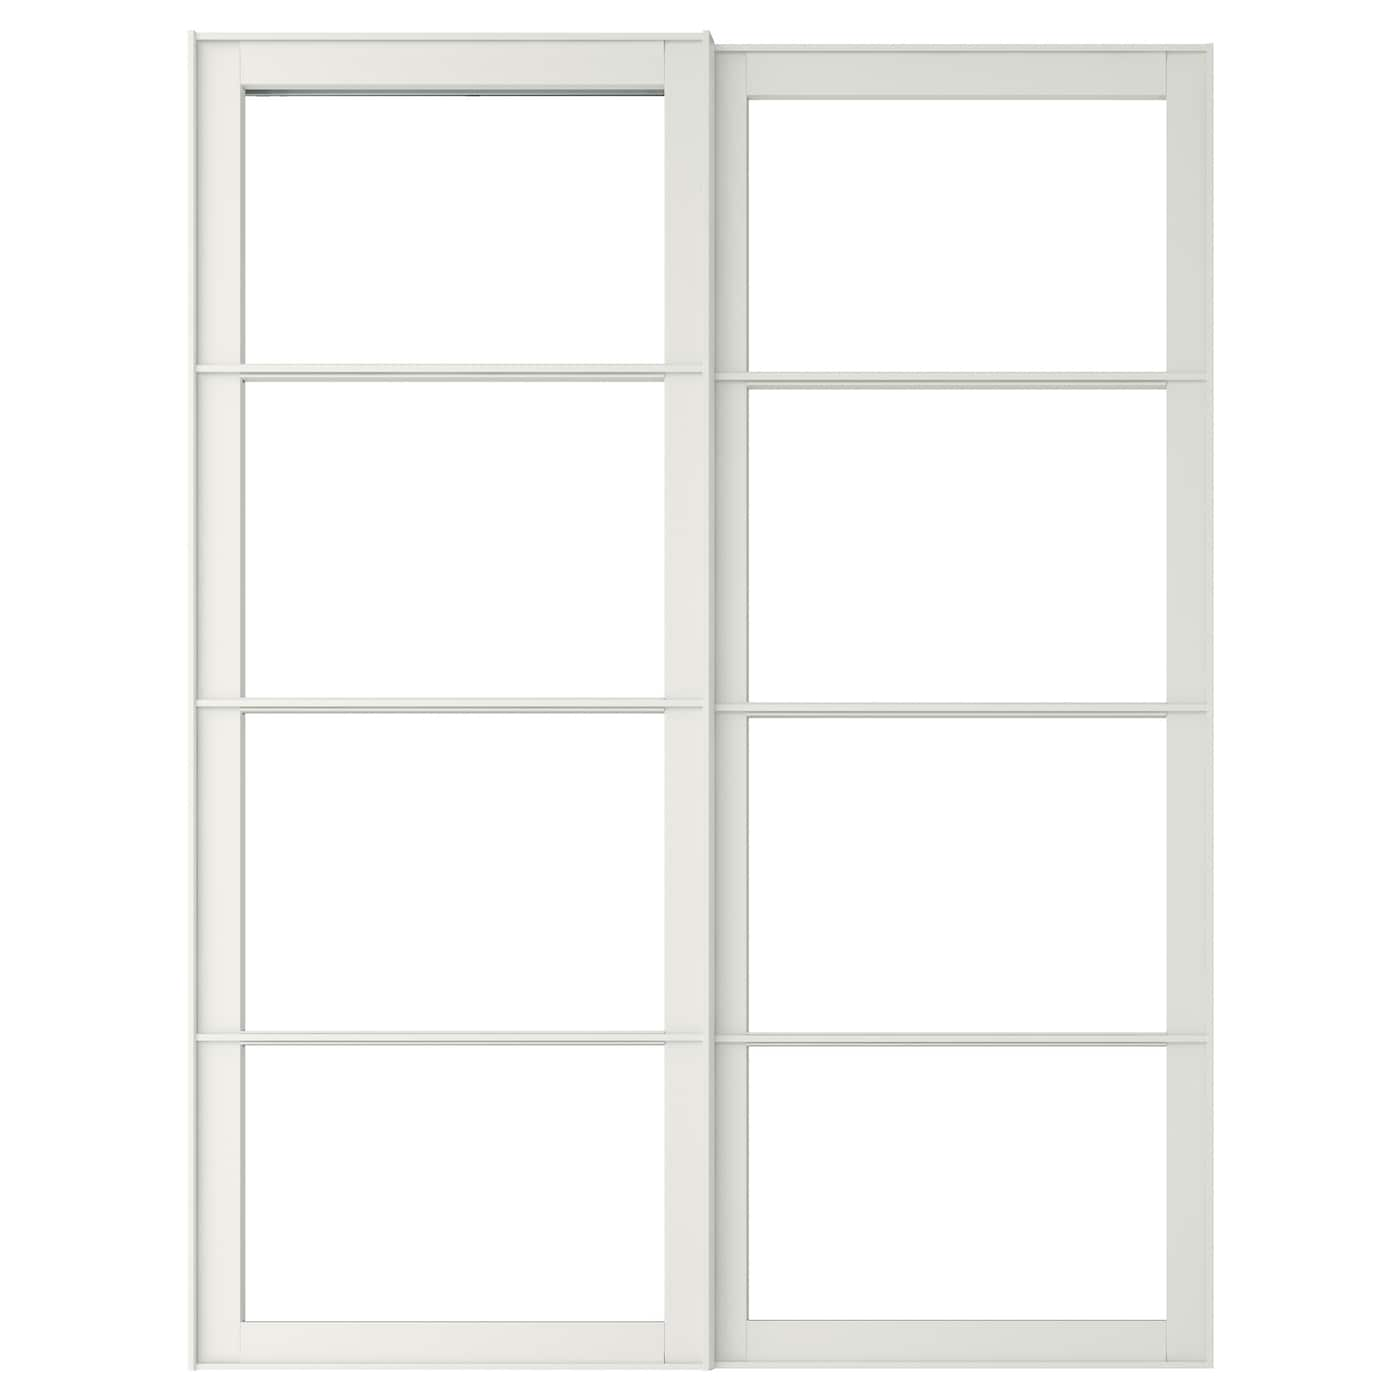 Materials ikea pax tonnes sliding doors white - Ikea Pax Pair Of Sliding Door Frames W Rail